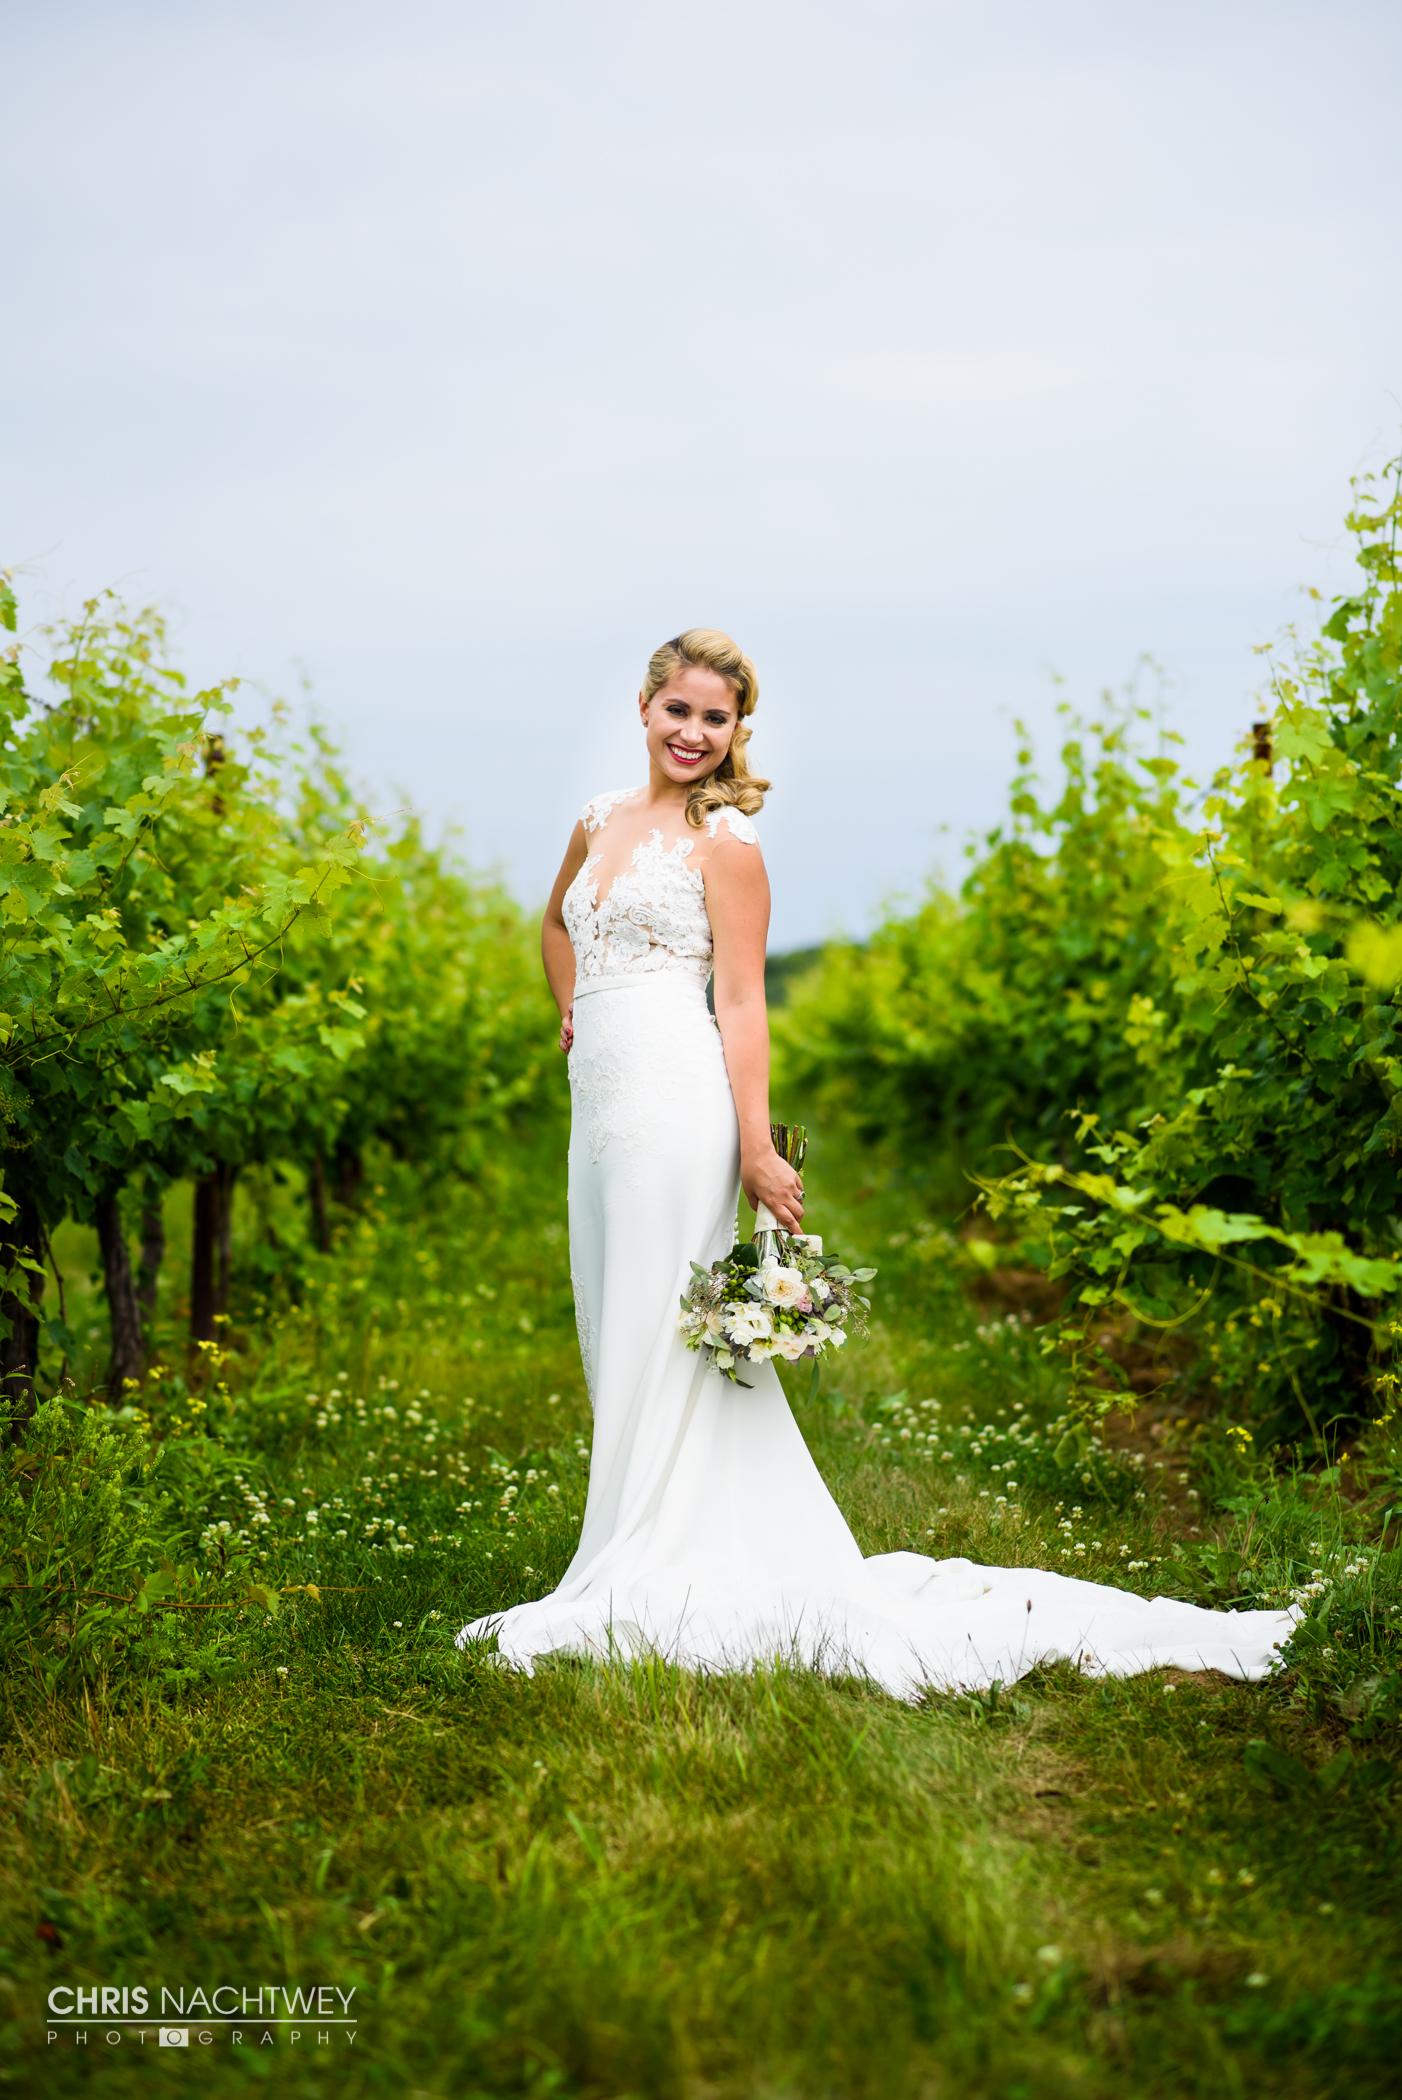 wedding-saltwater-farm-vineyard-photos-stonington-ct-chris-nachtwey-photography-2016-ana-austin-16.jpg